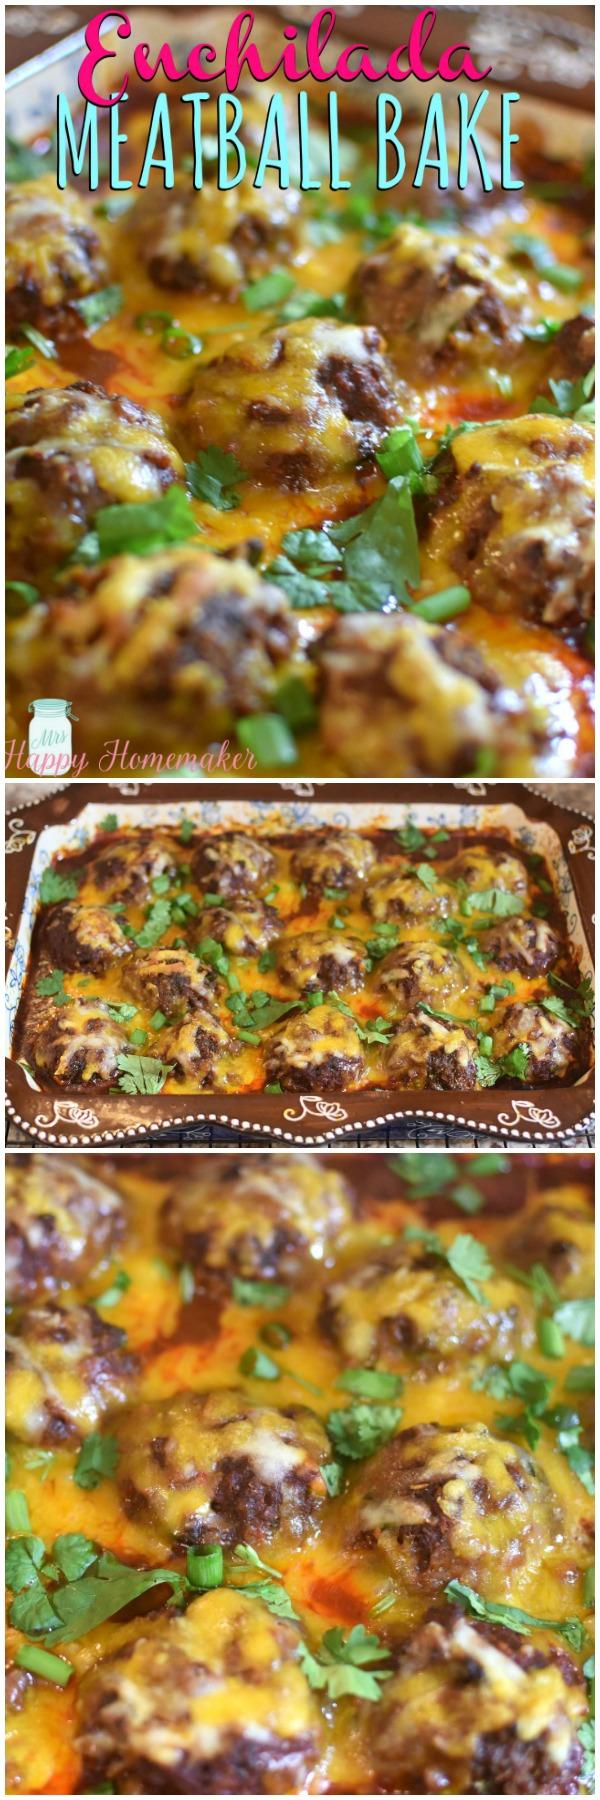 Enchilada Meatball Bake Casserole